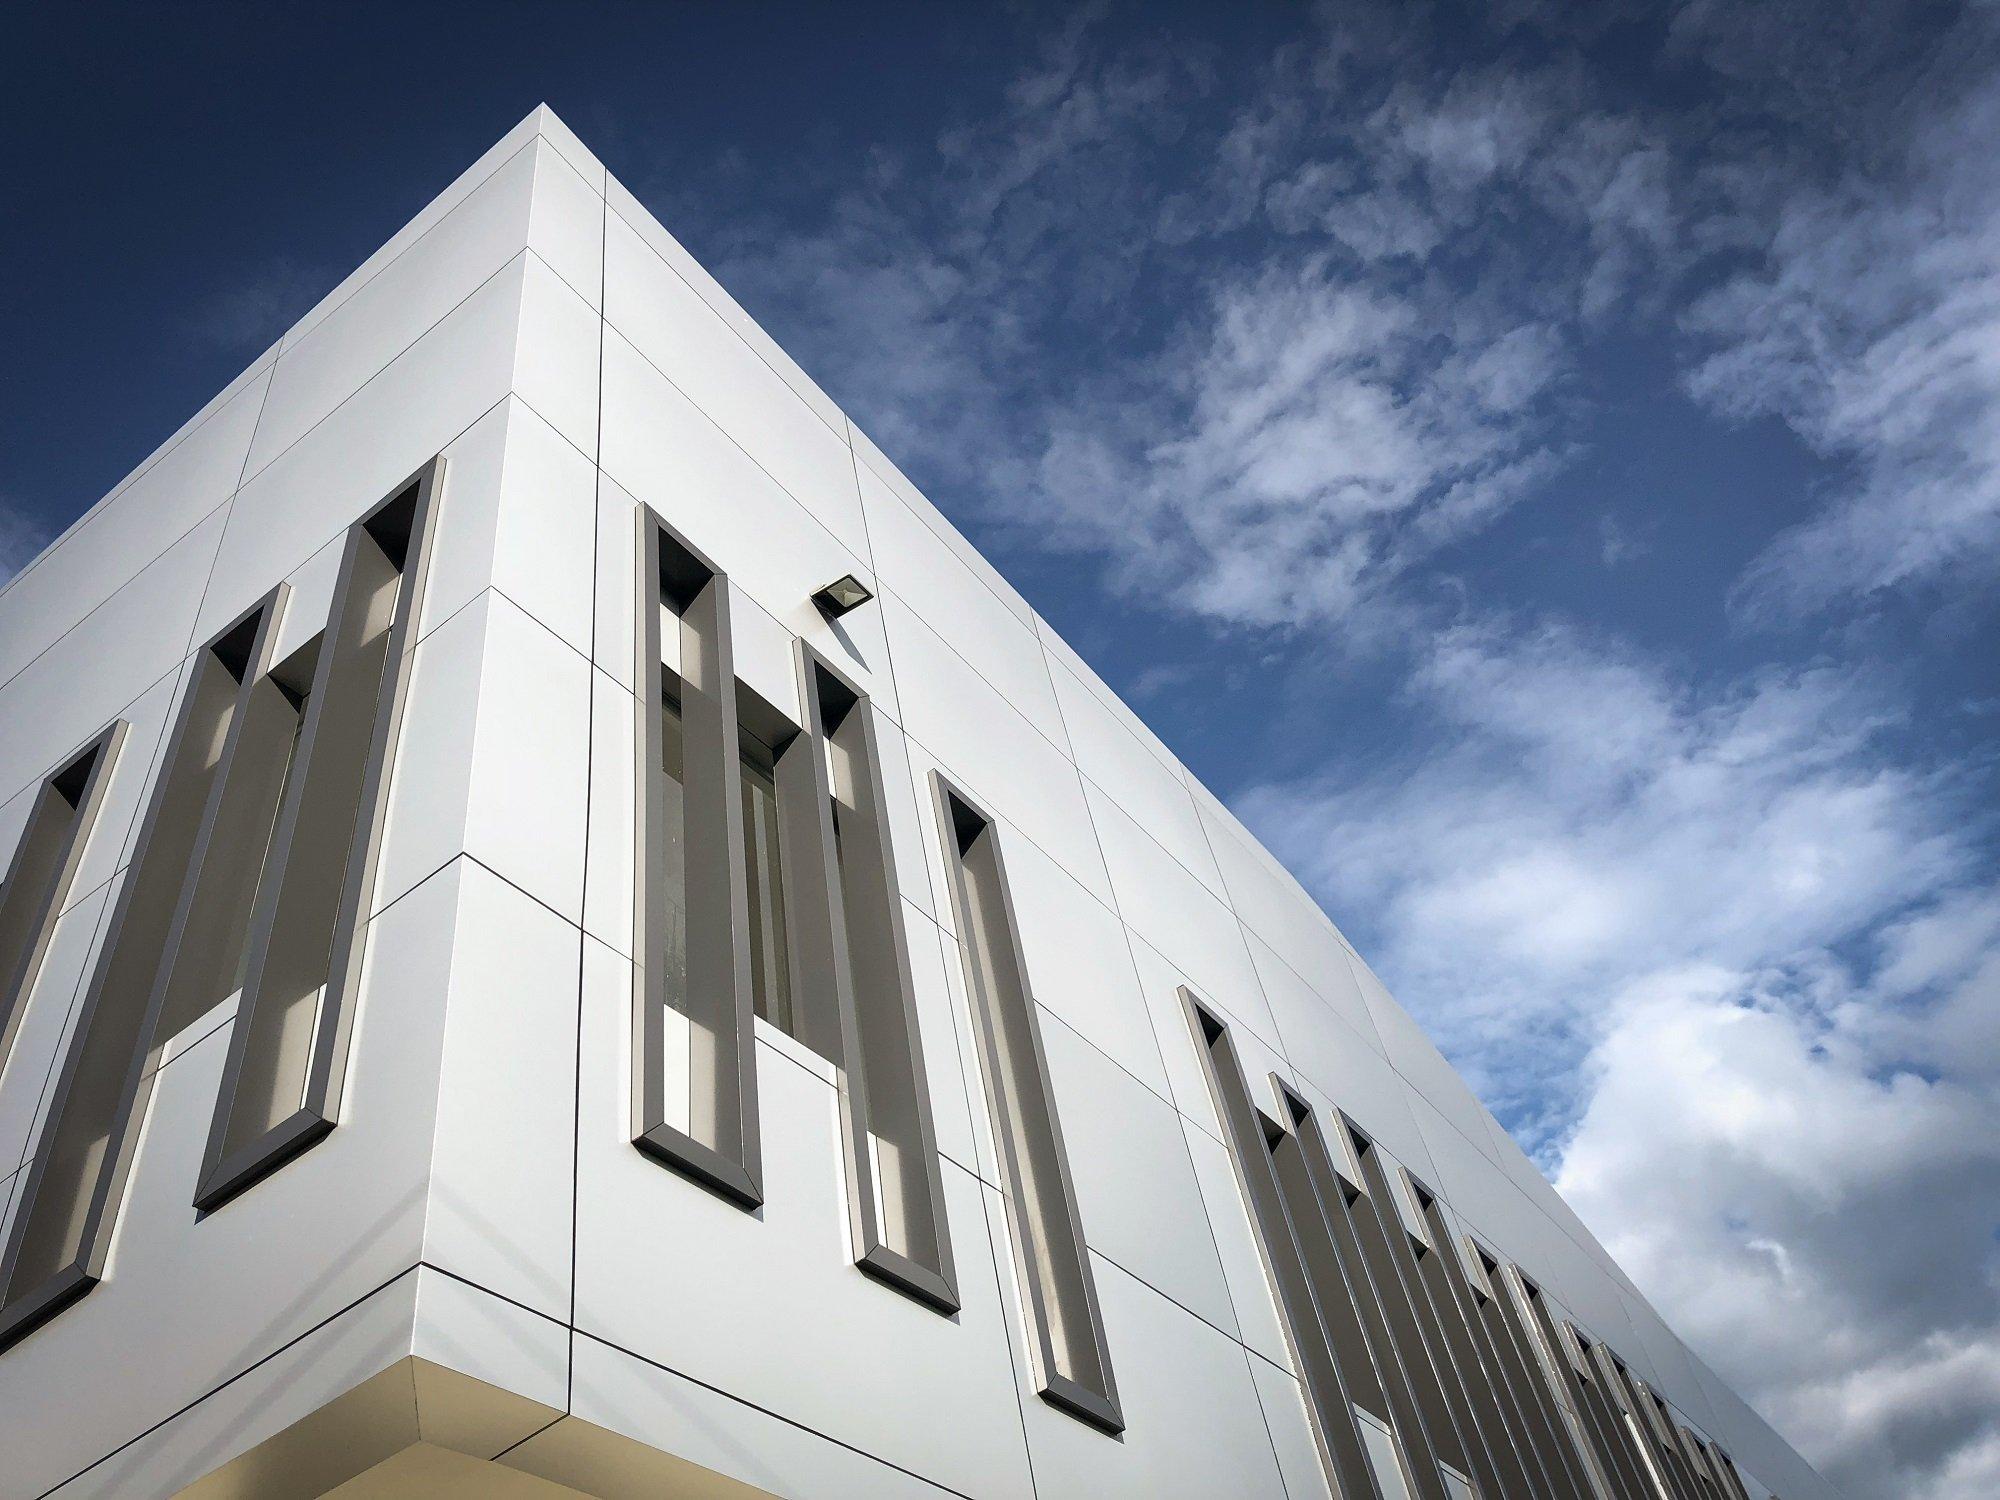 Centro-Convenciones-San-Sebastian-Sangolqui-A3-Arquitectos-Quito-Ecuador-1